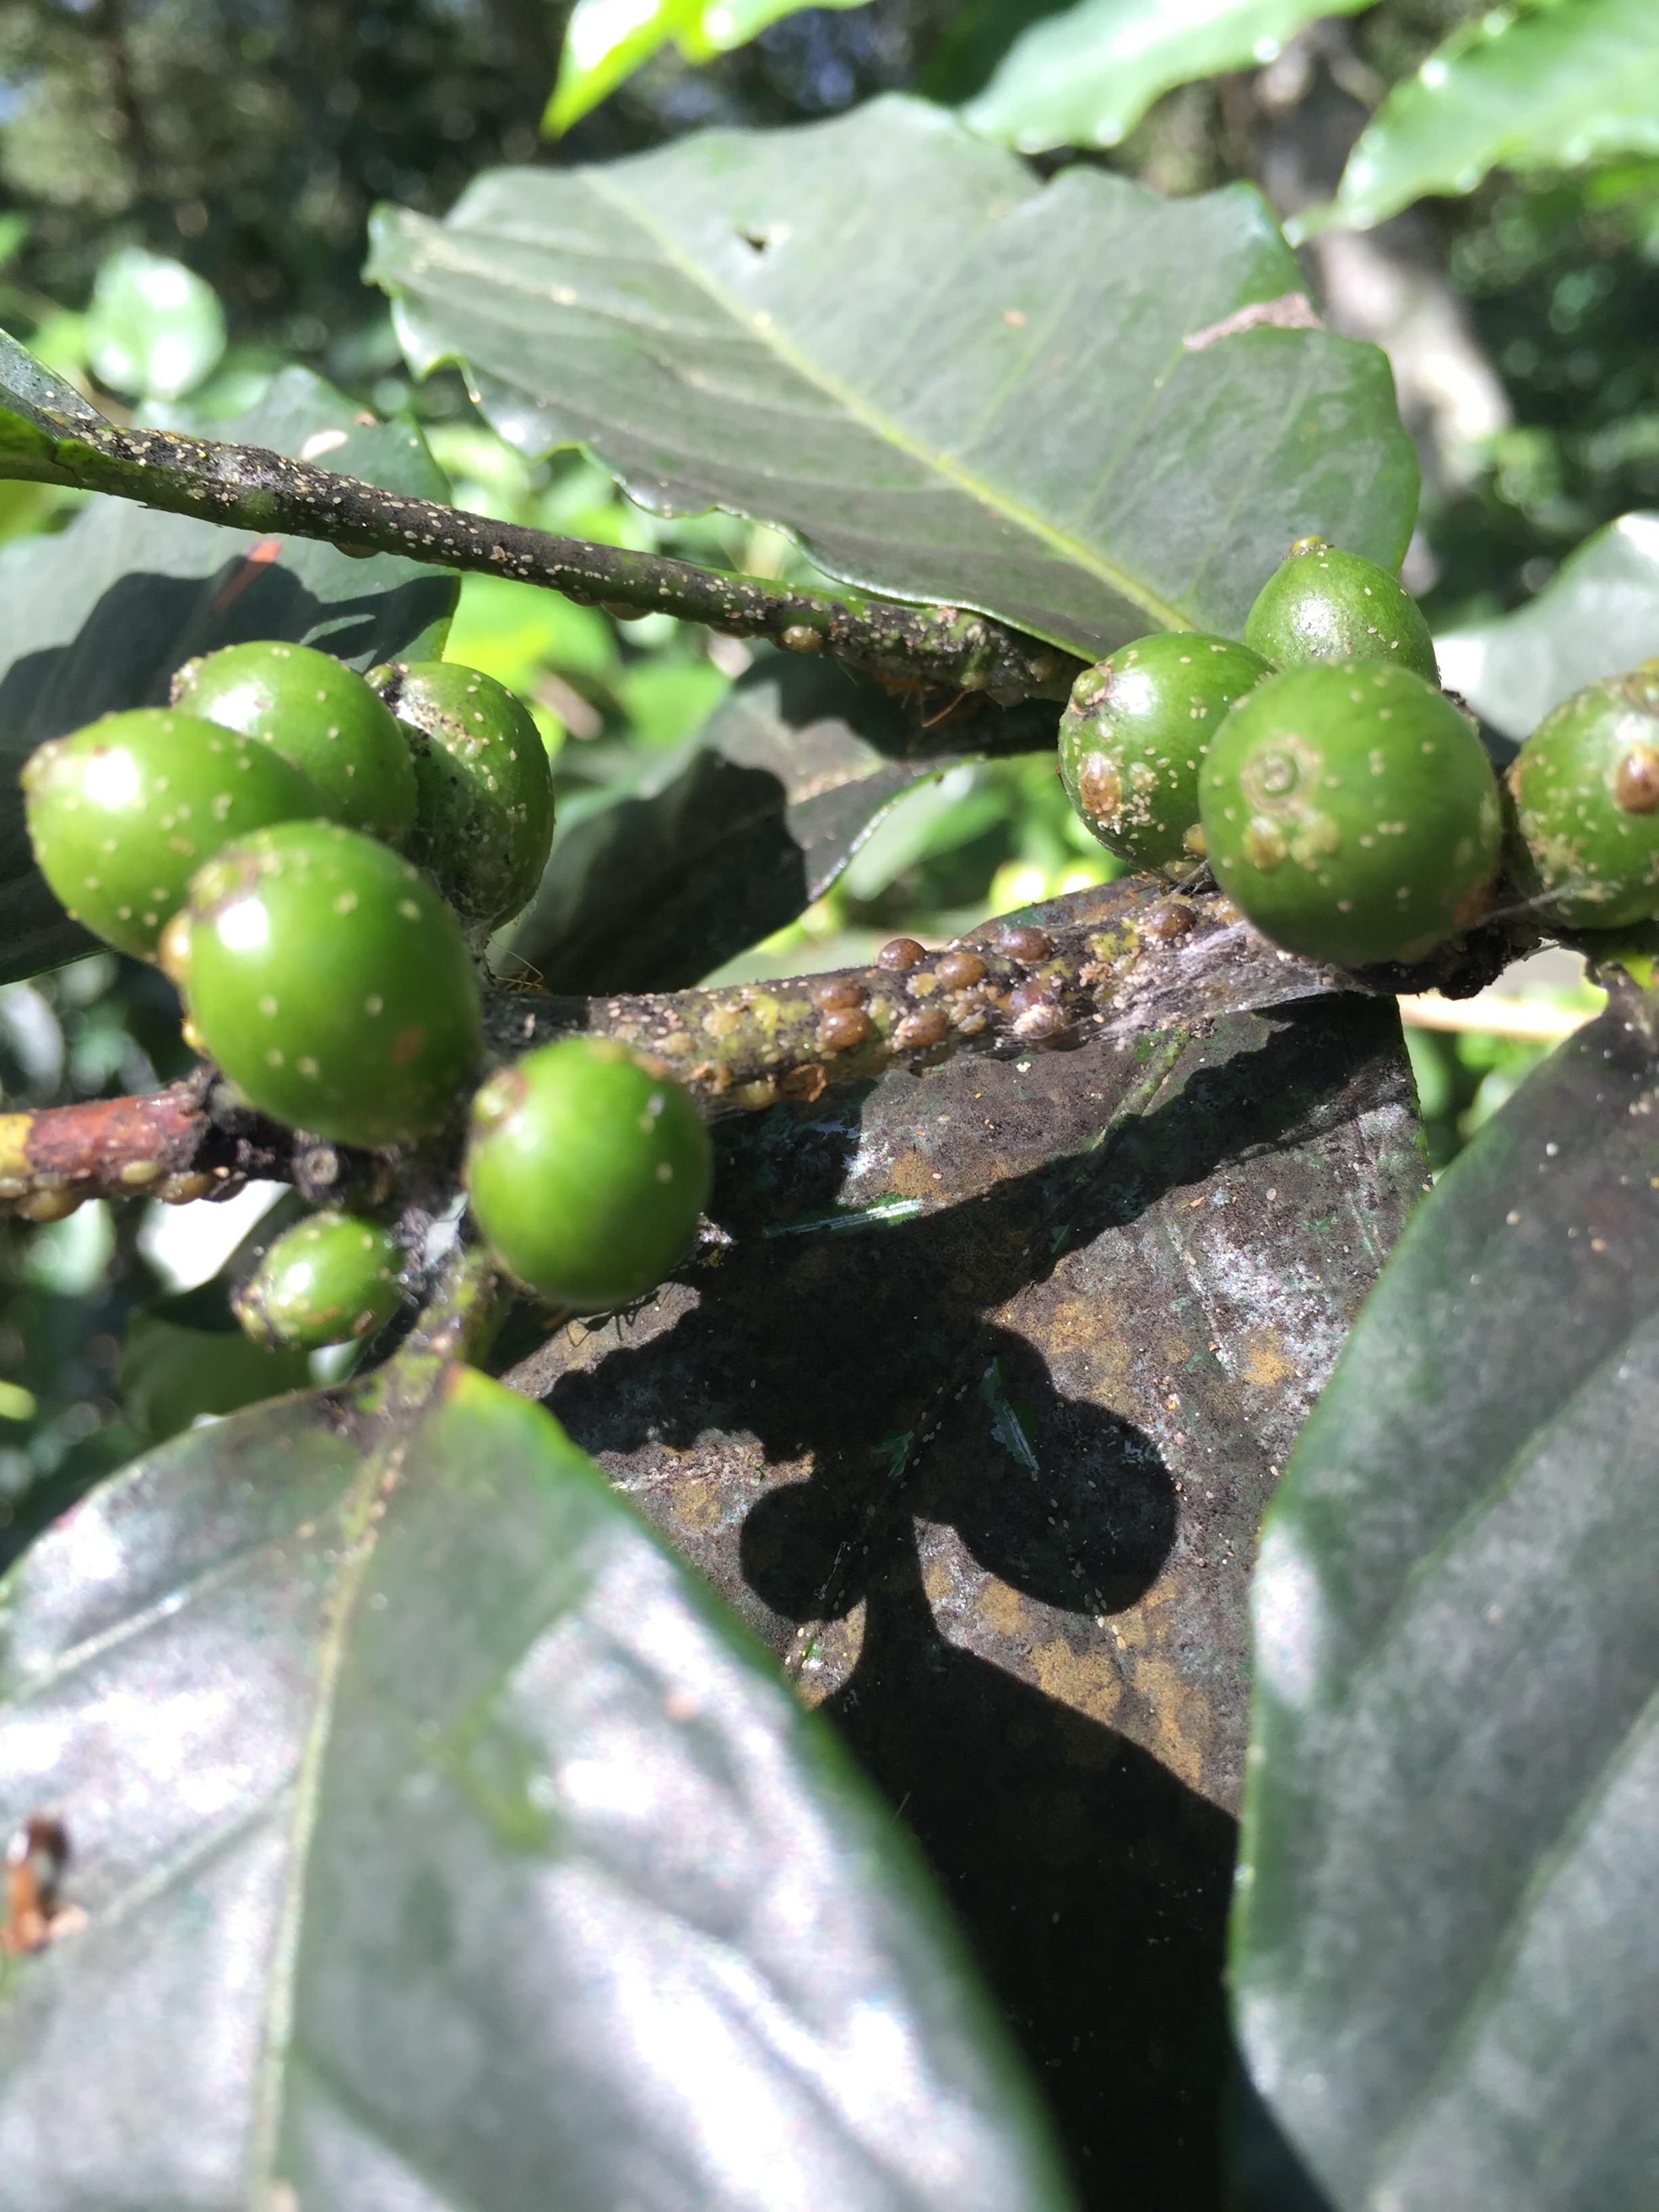 Coccus Viridis -Green Coffee Scale Disease